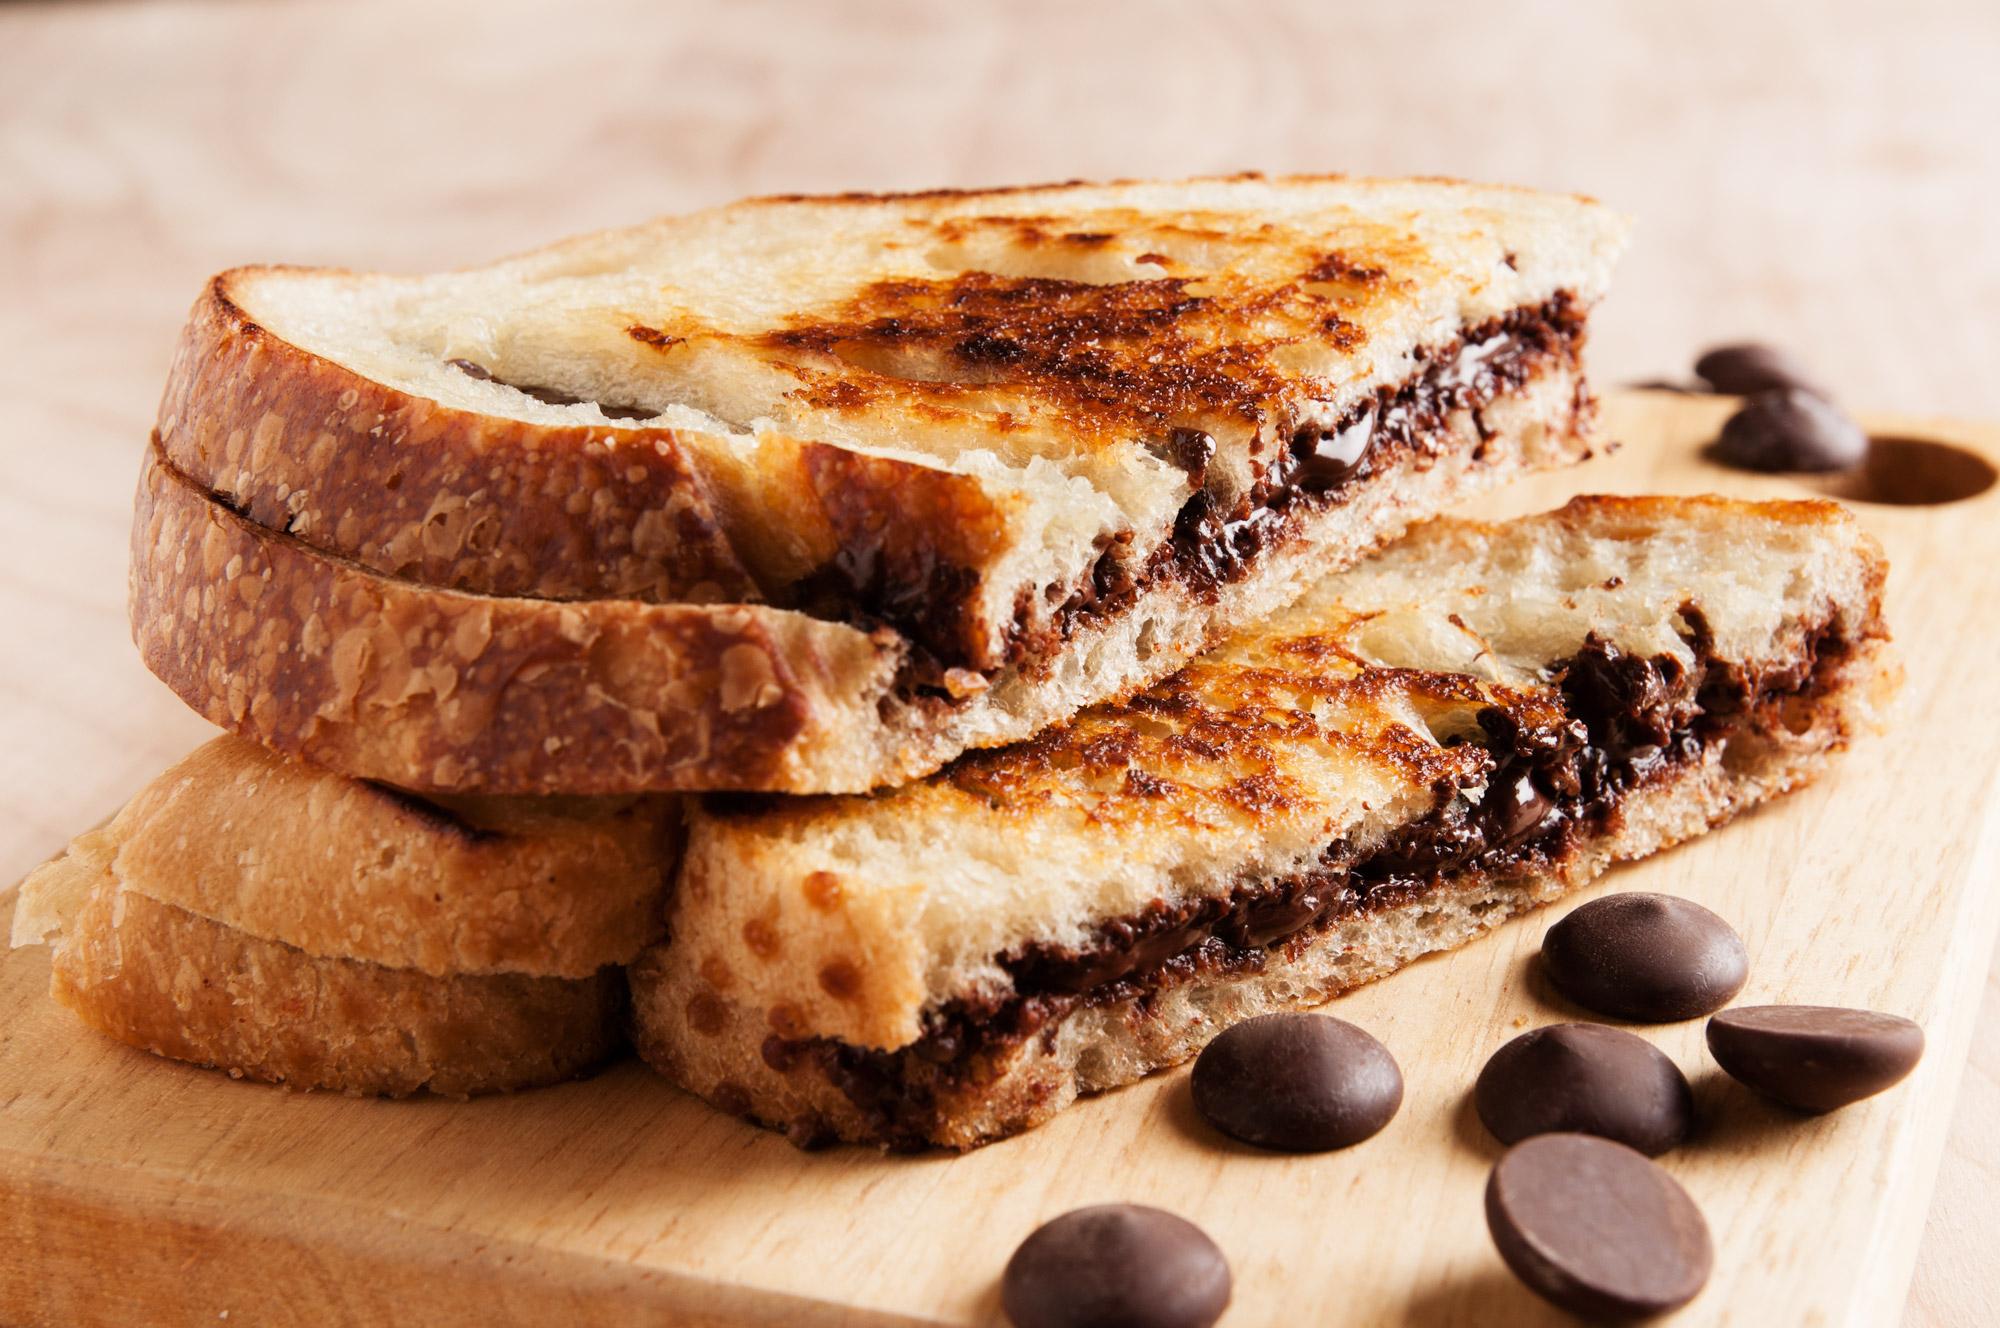 Chocolate And Banana Toasted Sandwich